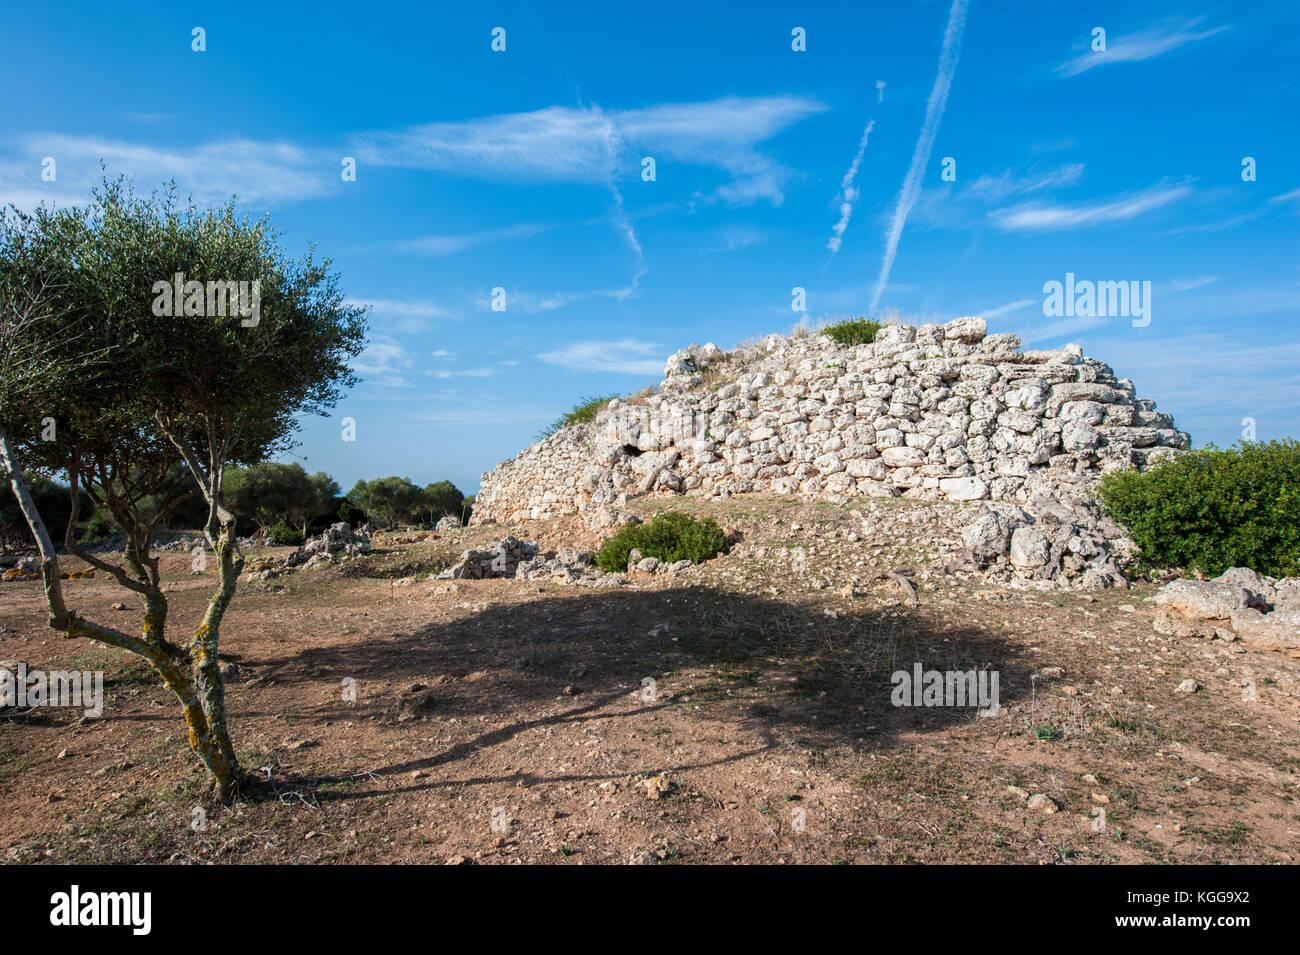 Talaiotic sanctuary complex in So na Cacana, Menorca, Balearic Islands, Spain, Mediterranean Sea. - Stock Image